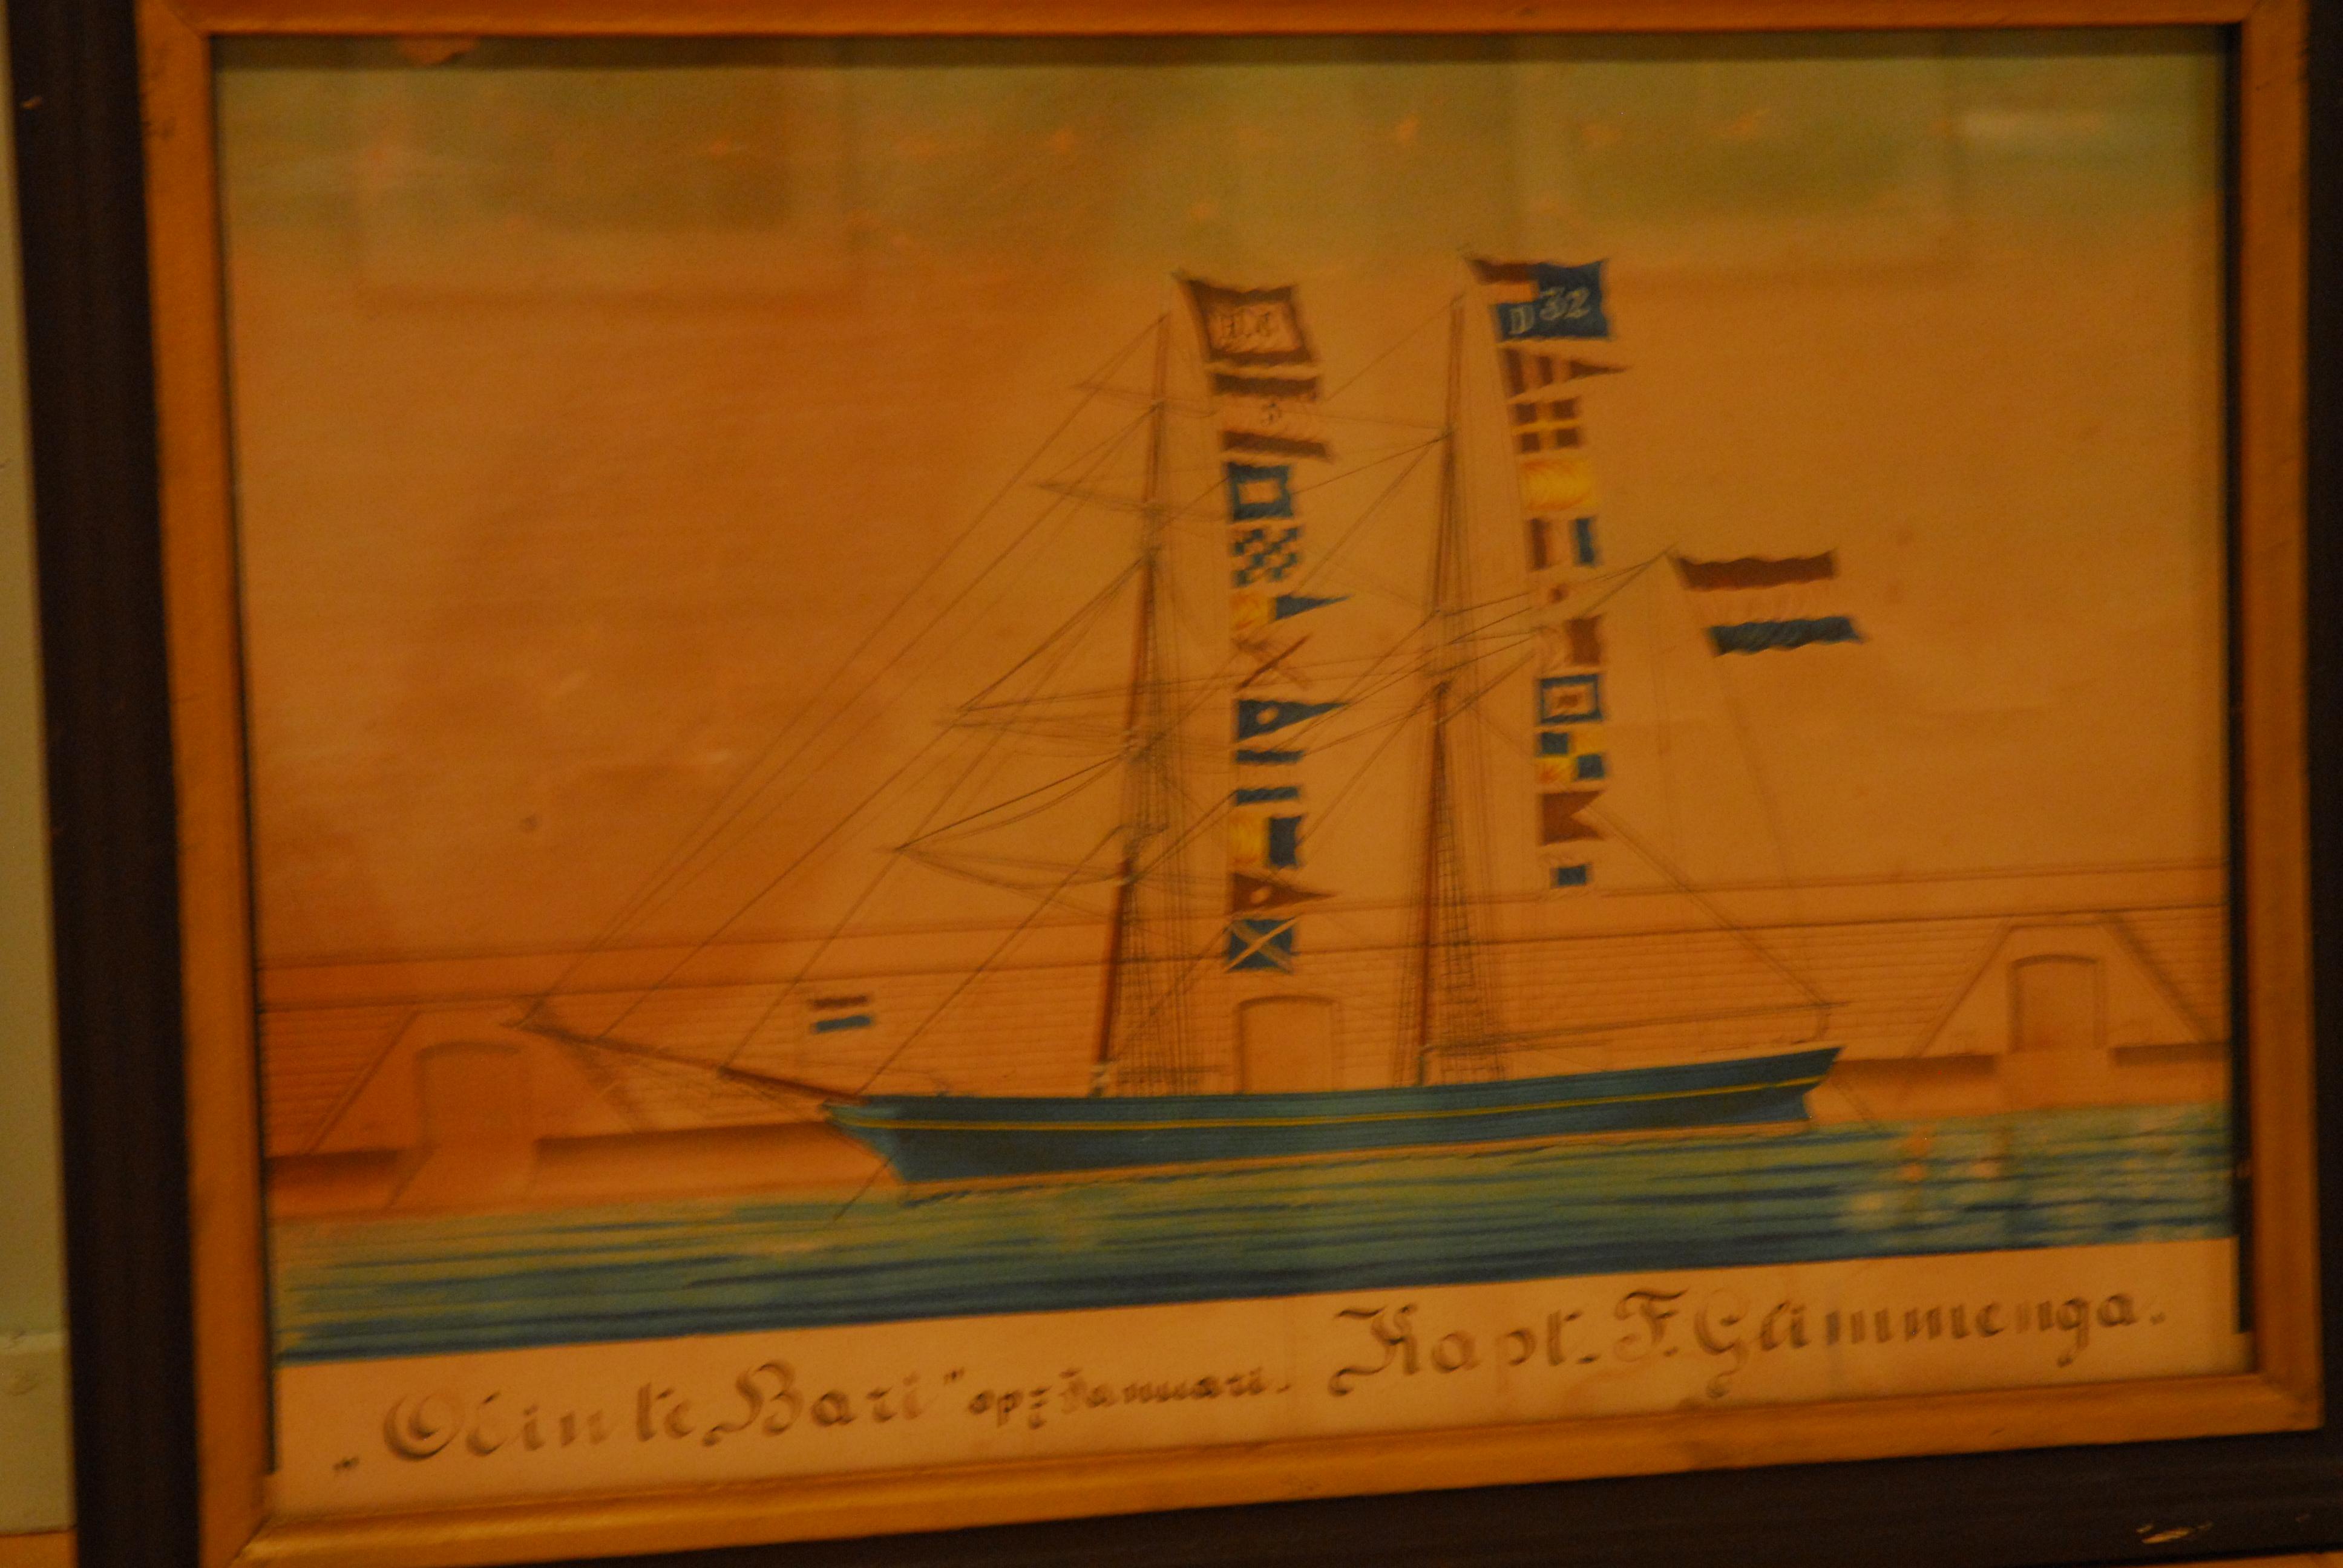 aquarel schoenerbrik Odin te Bari, kapt. F. Glimmenga